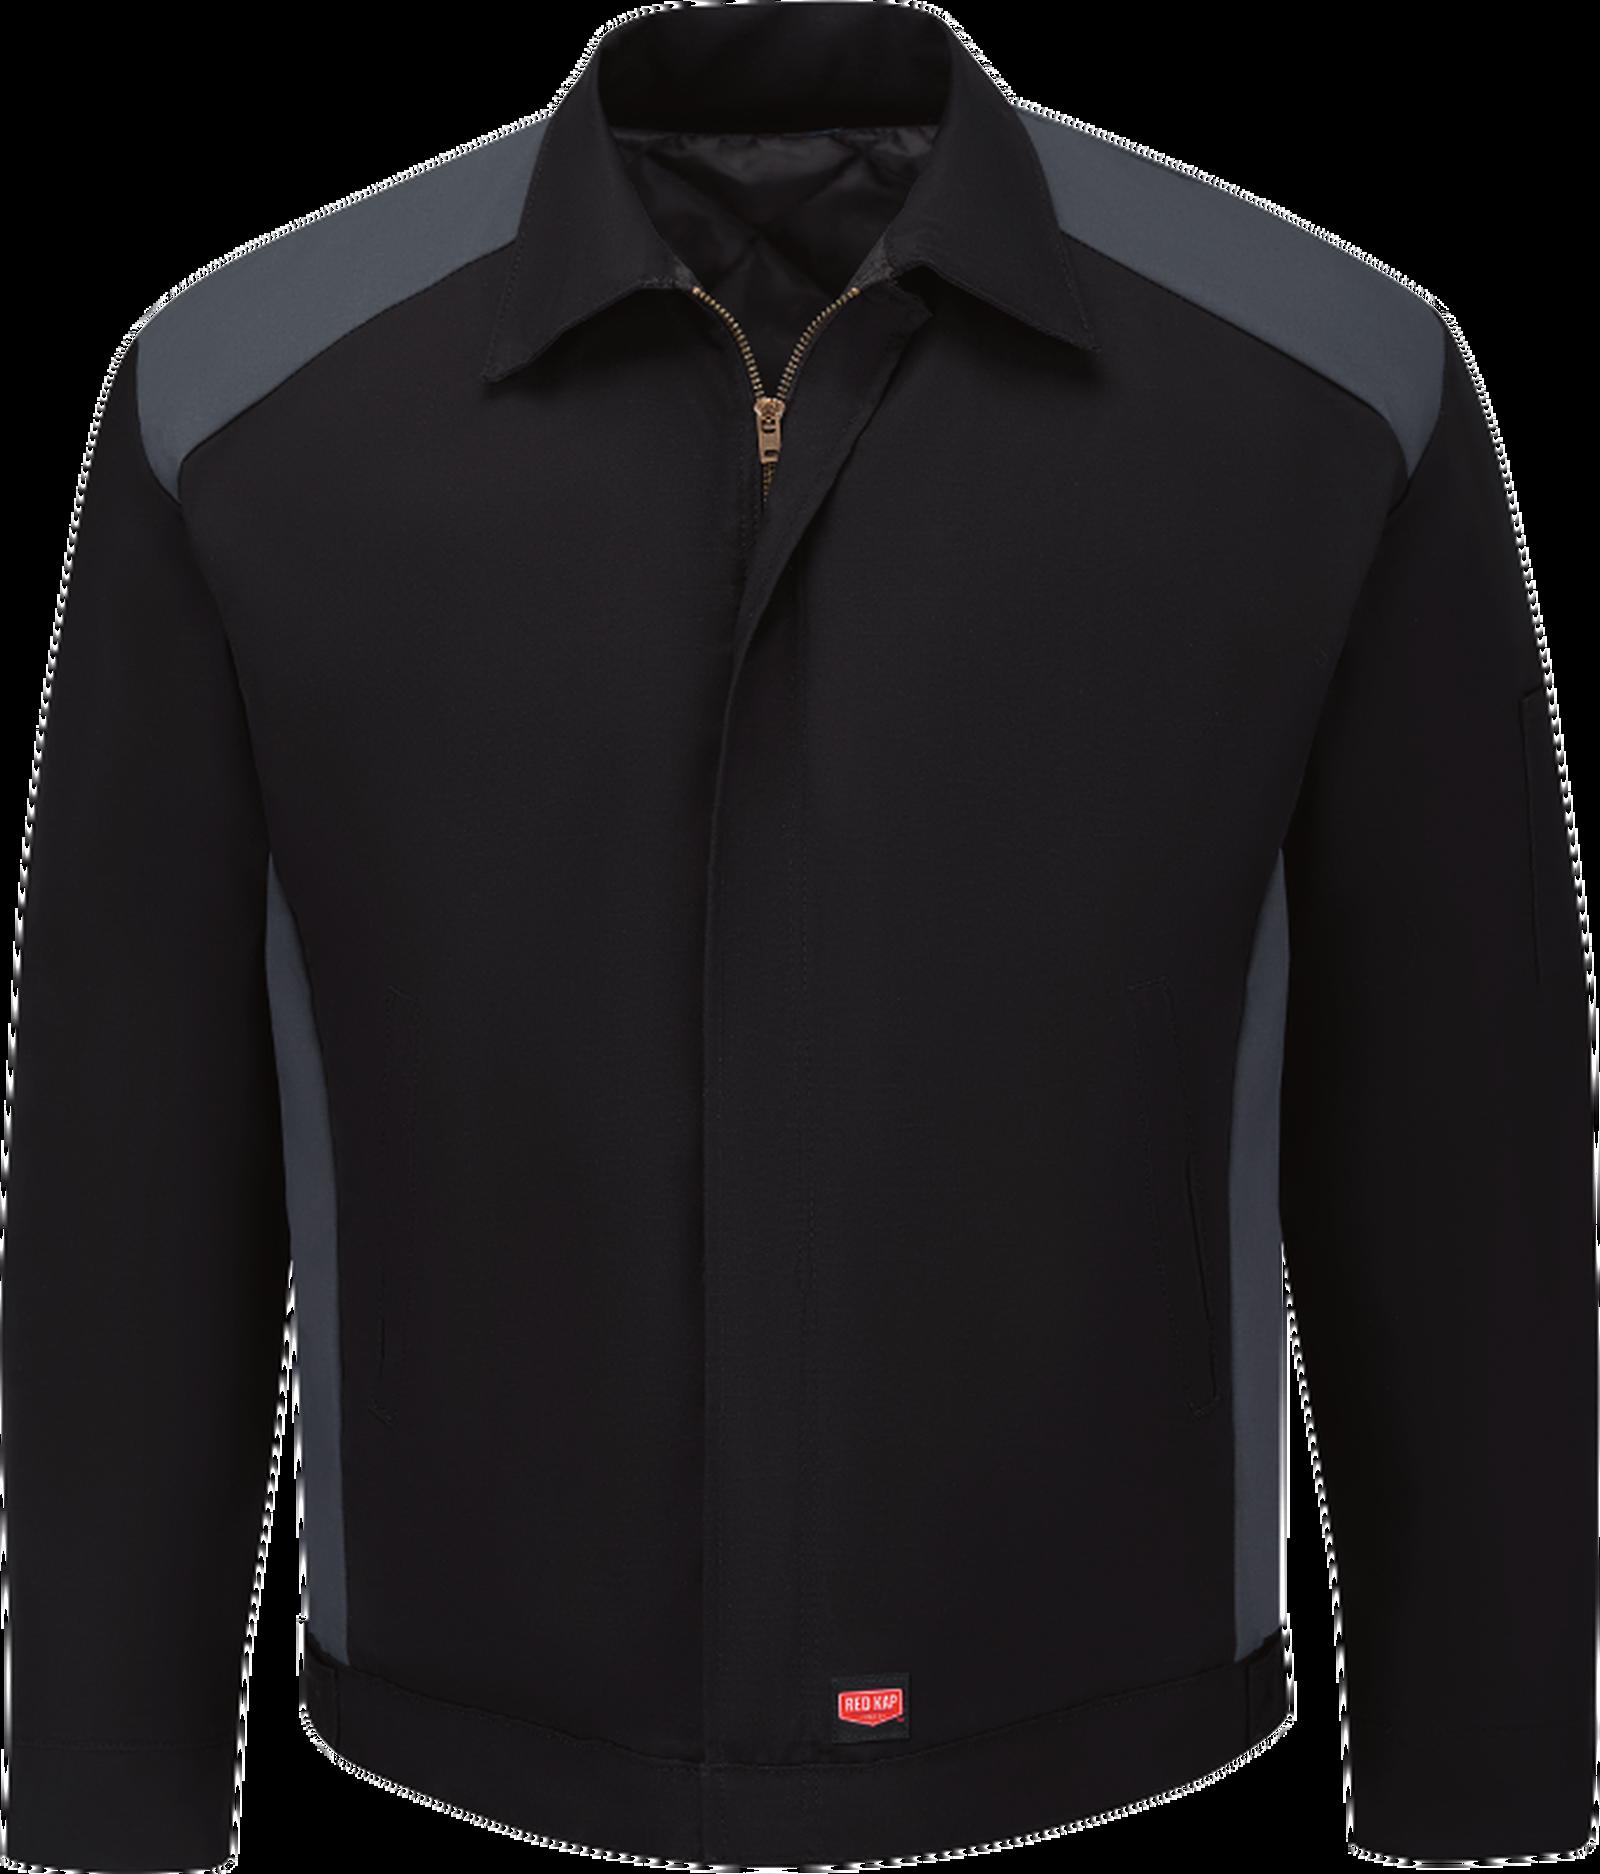 Men's Performance Crew Jacket